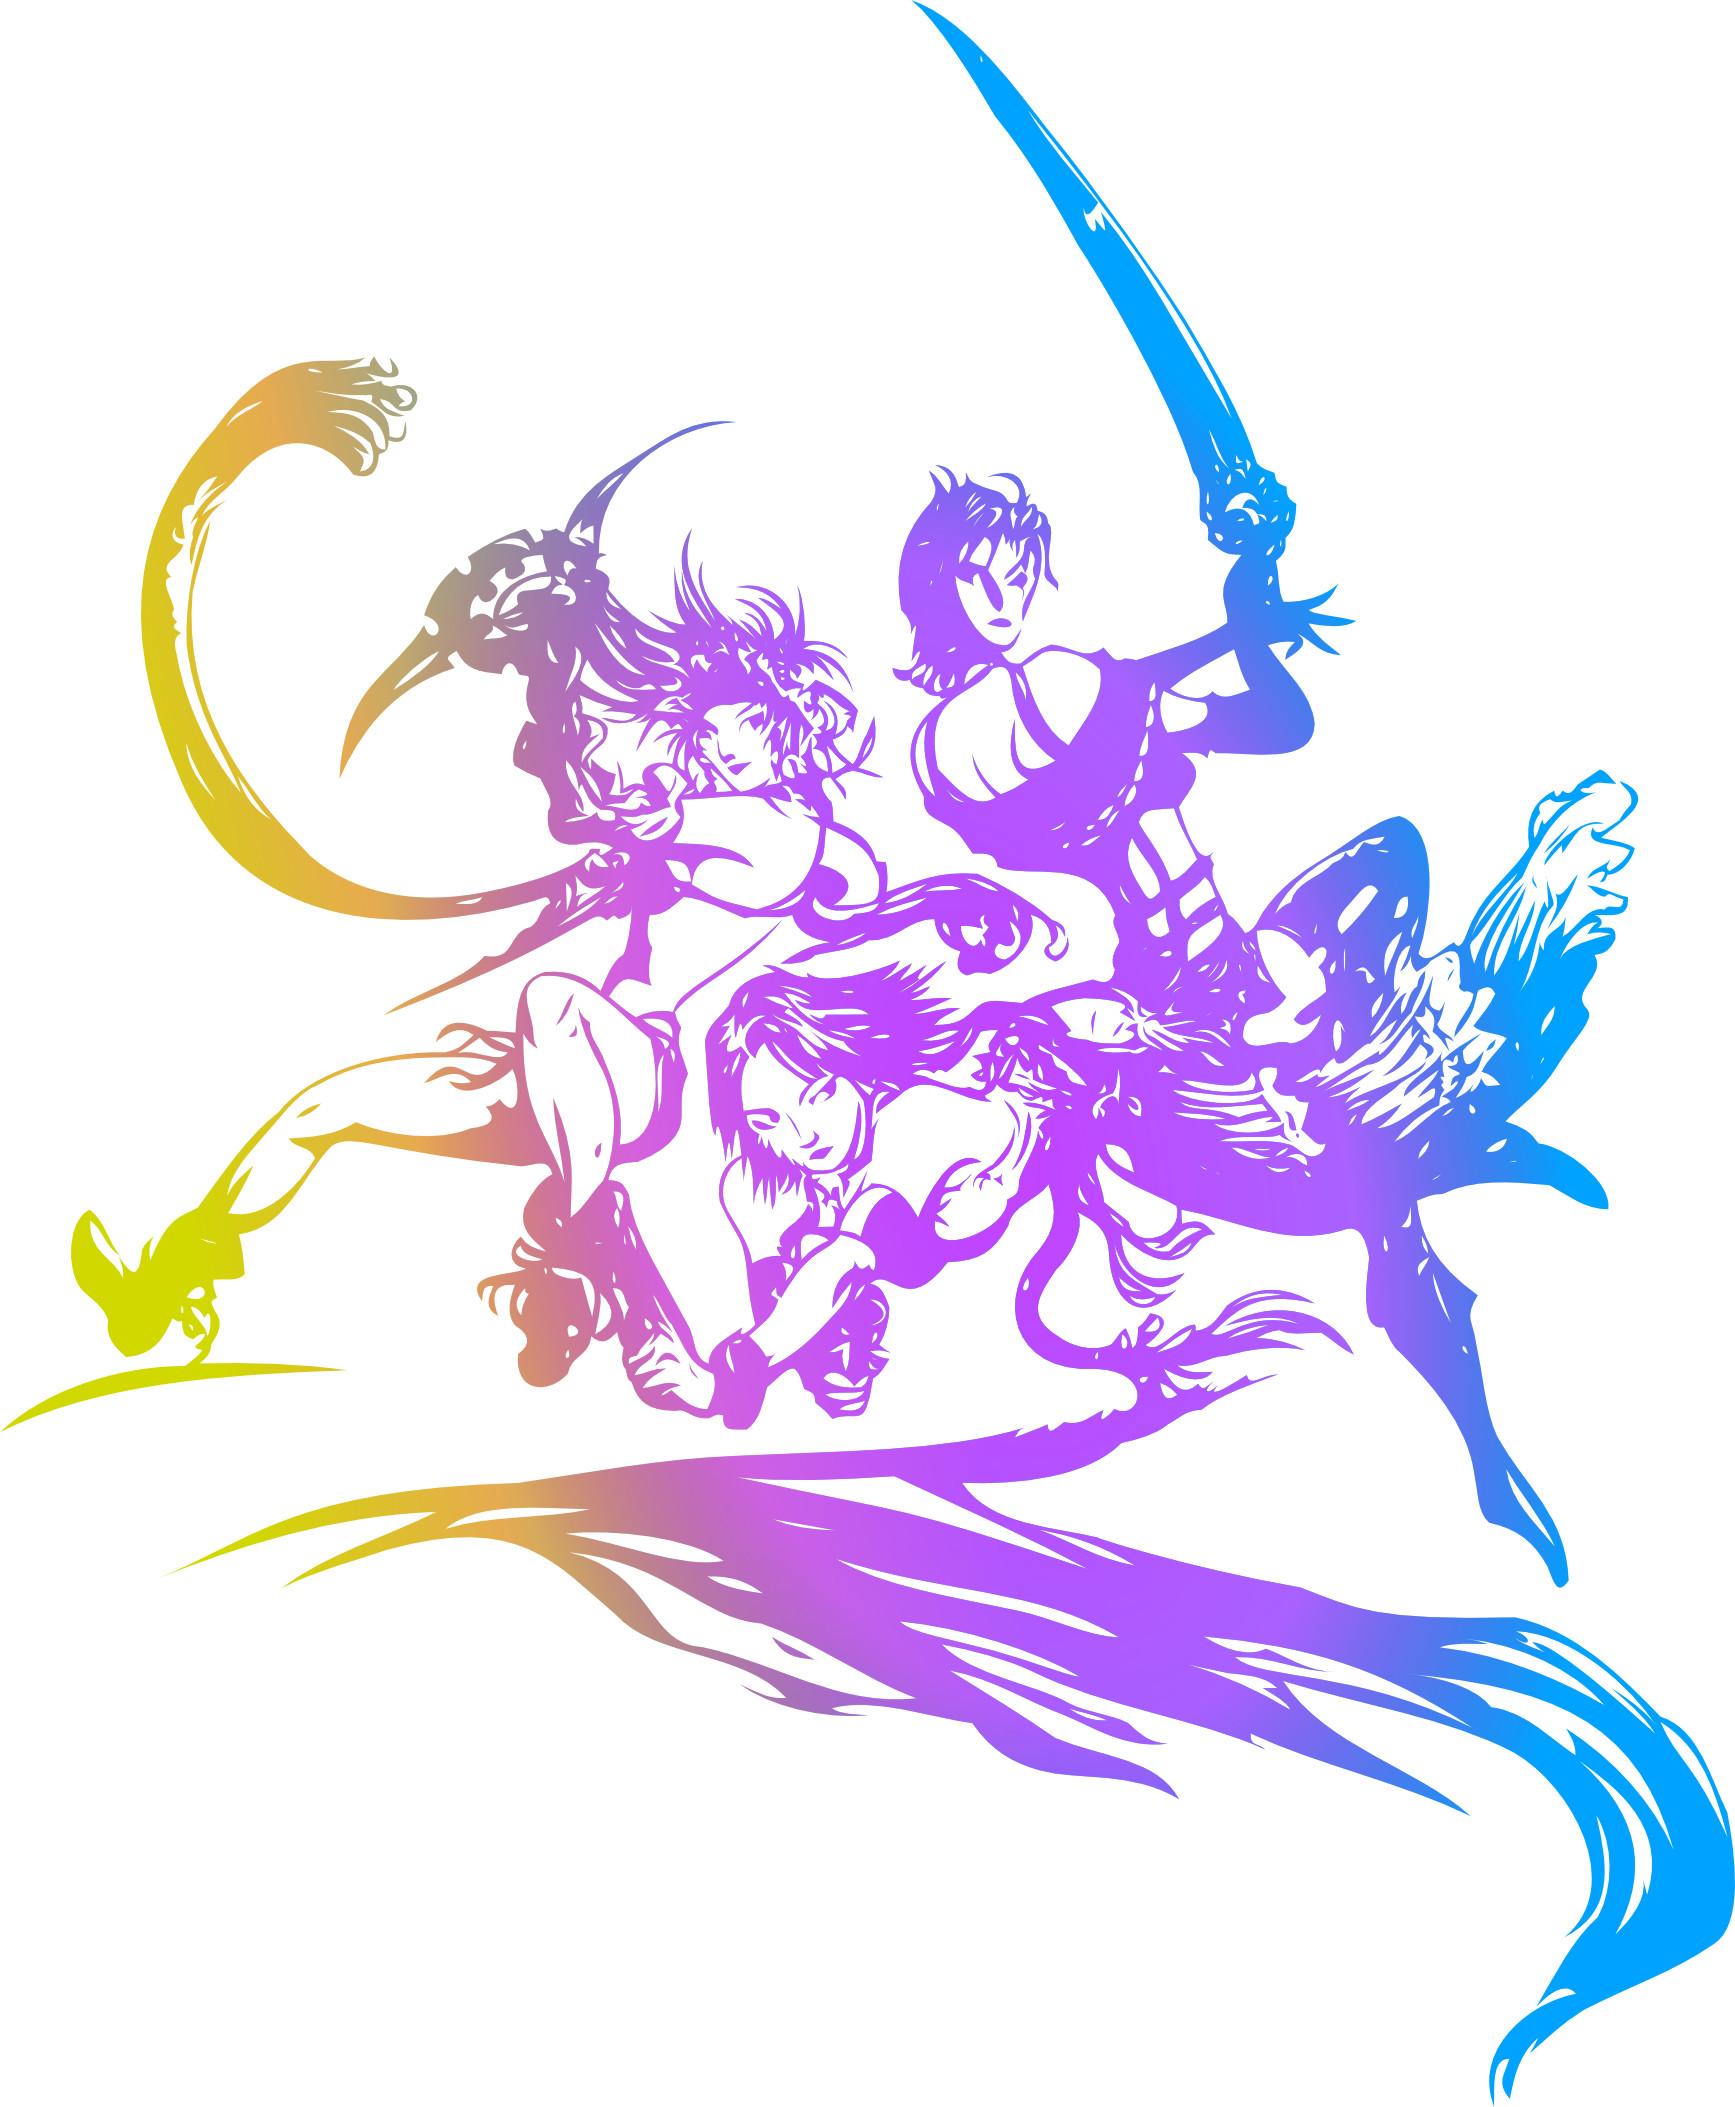 Final Fantasy X Character Art